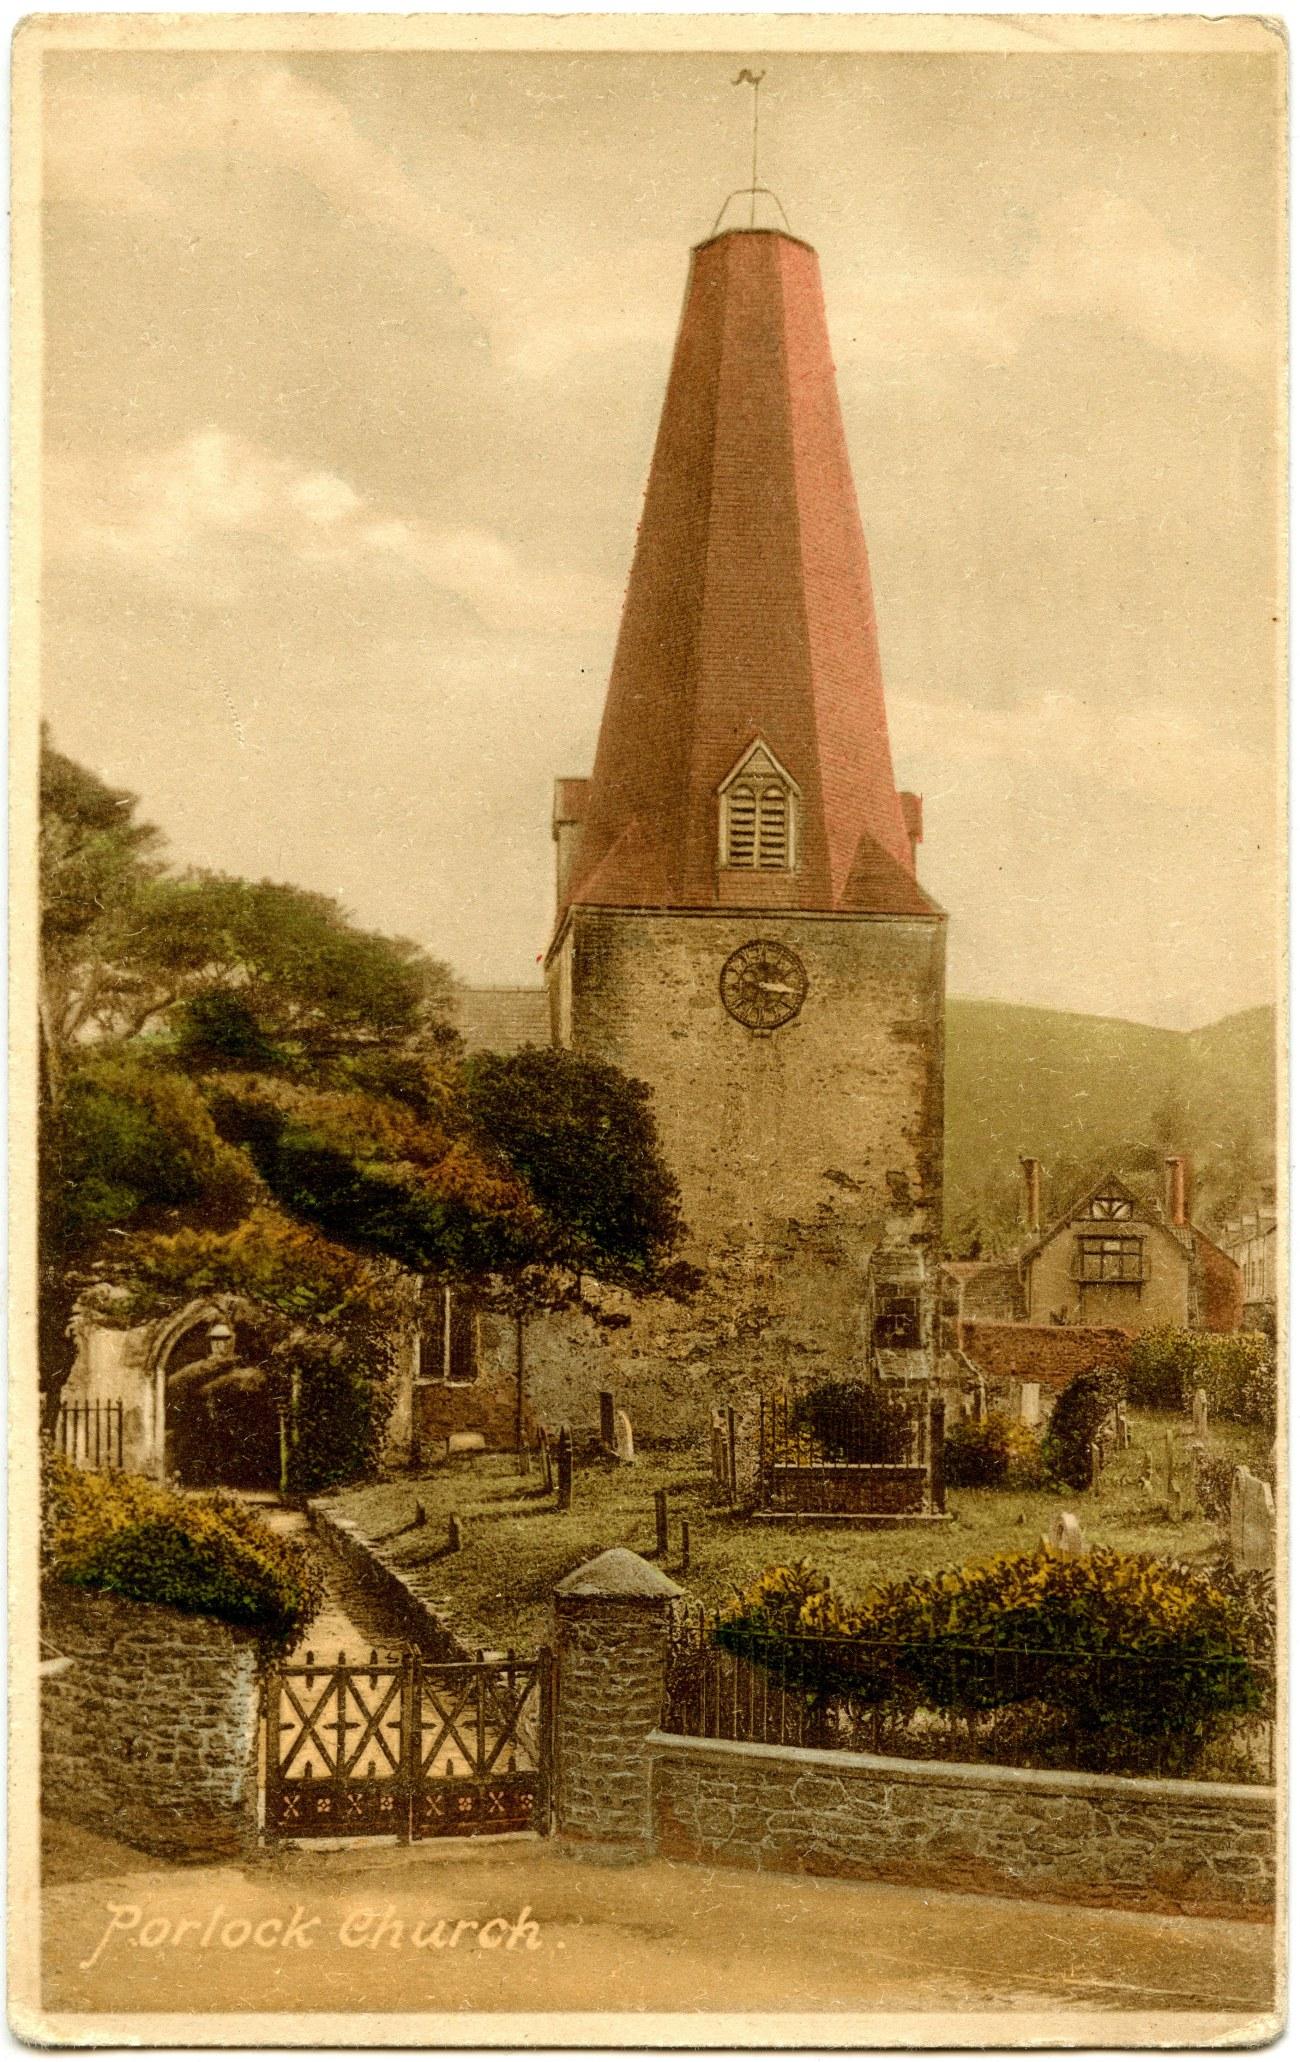 Porlock Church